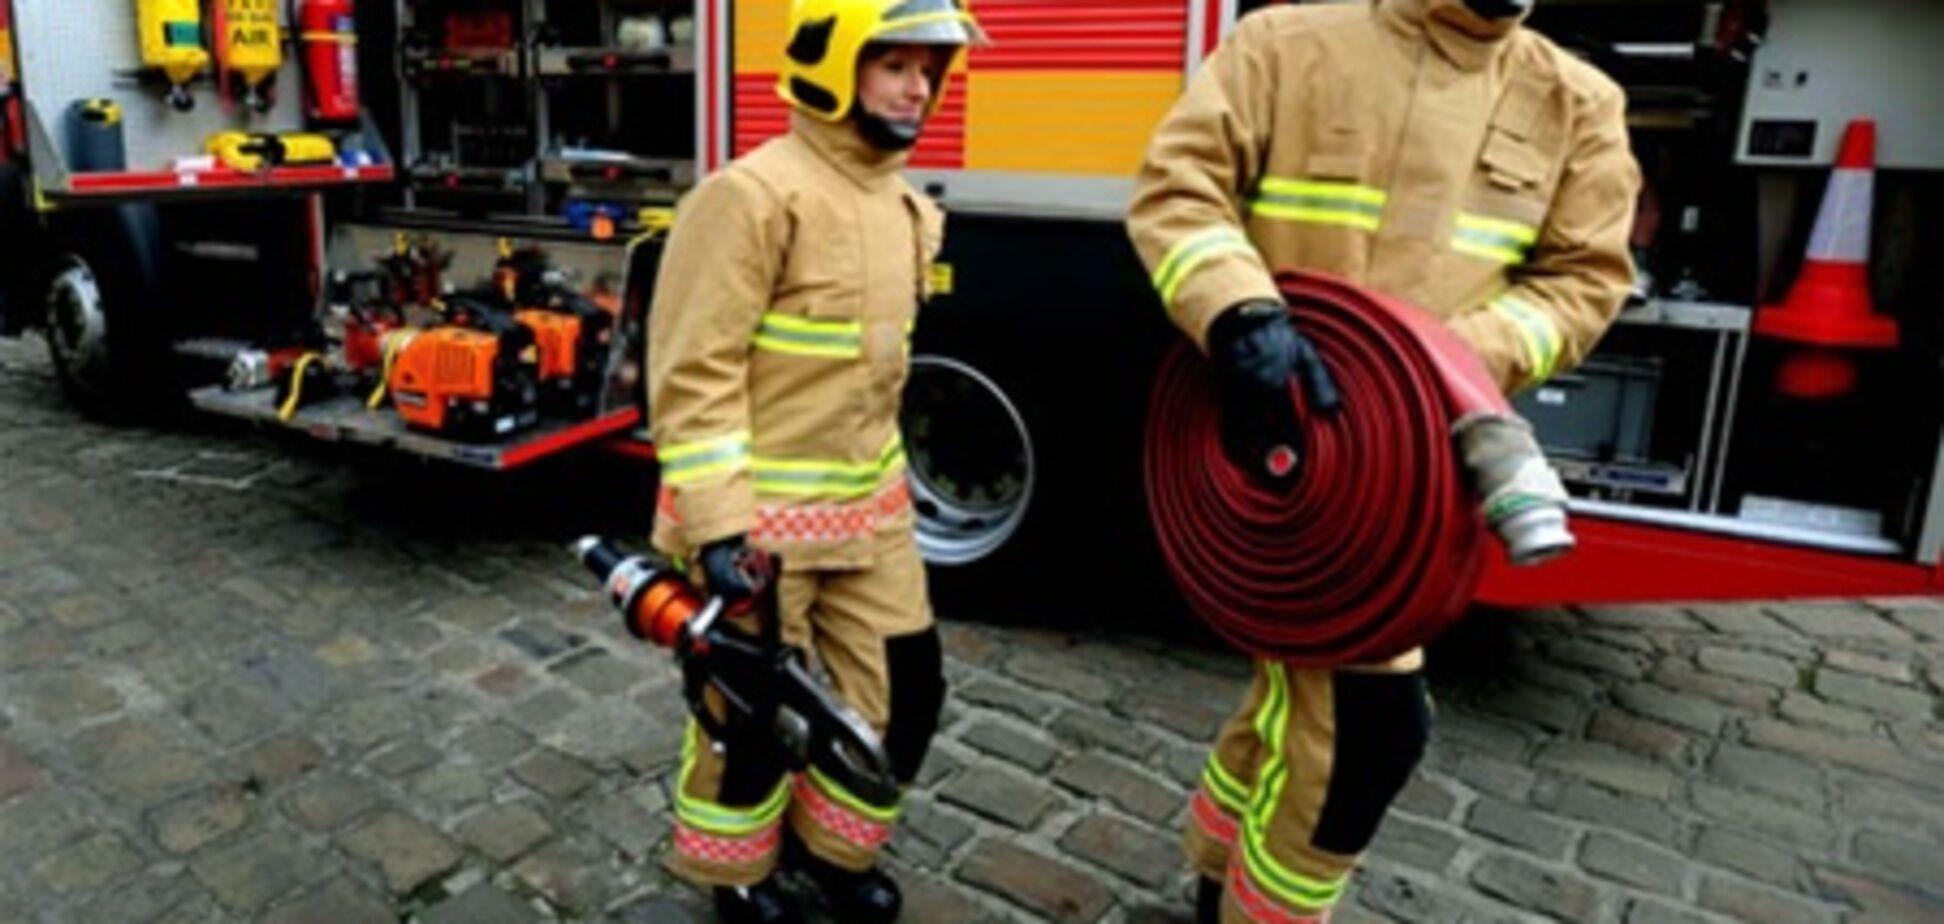 Пожежник зламав ногу, рятуючи золоту рибку